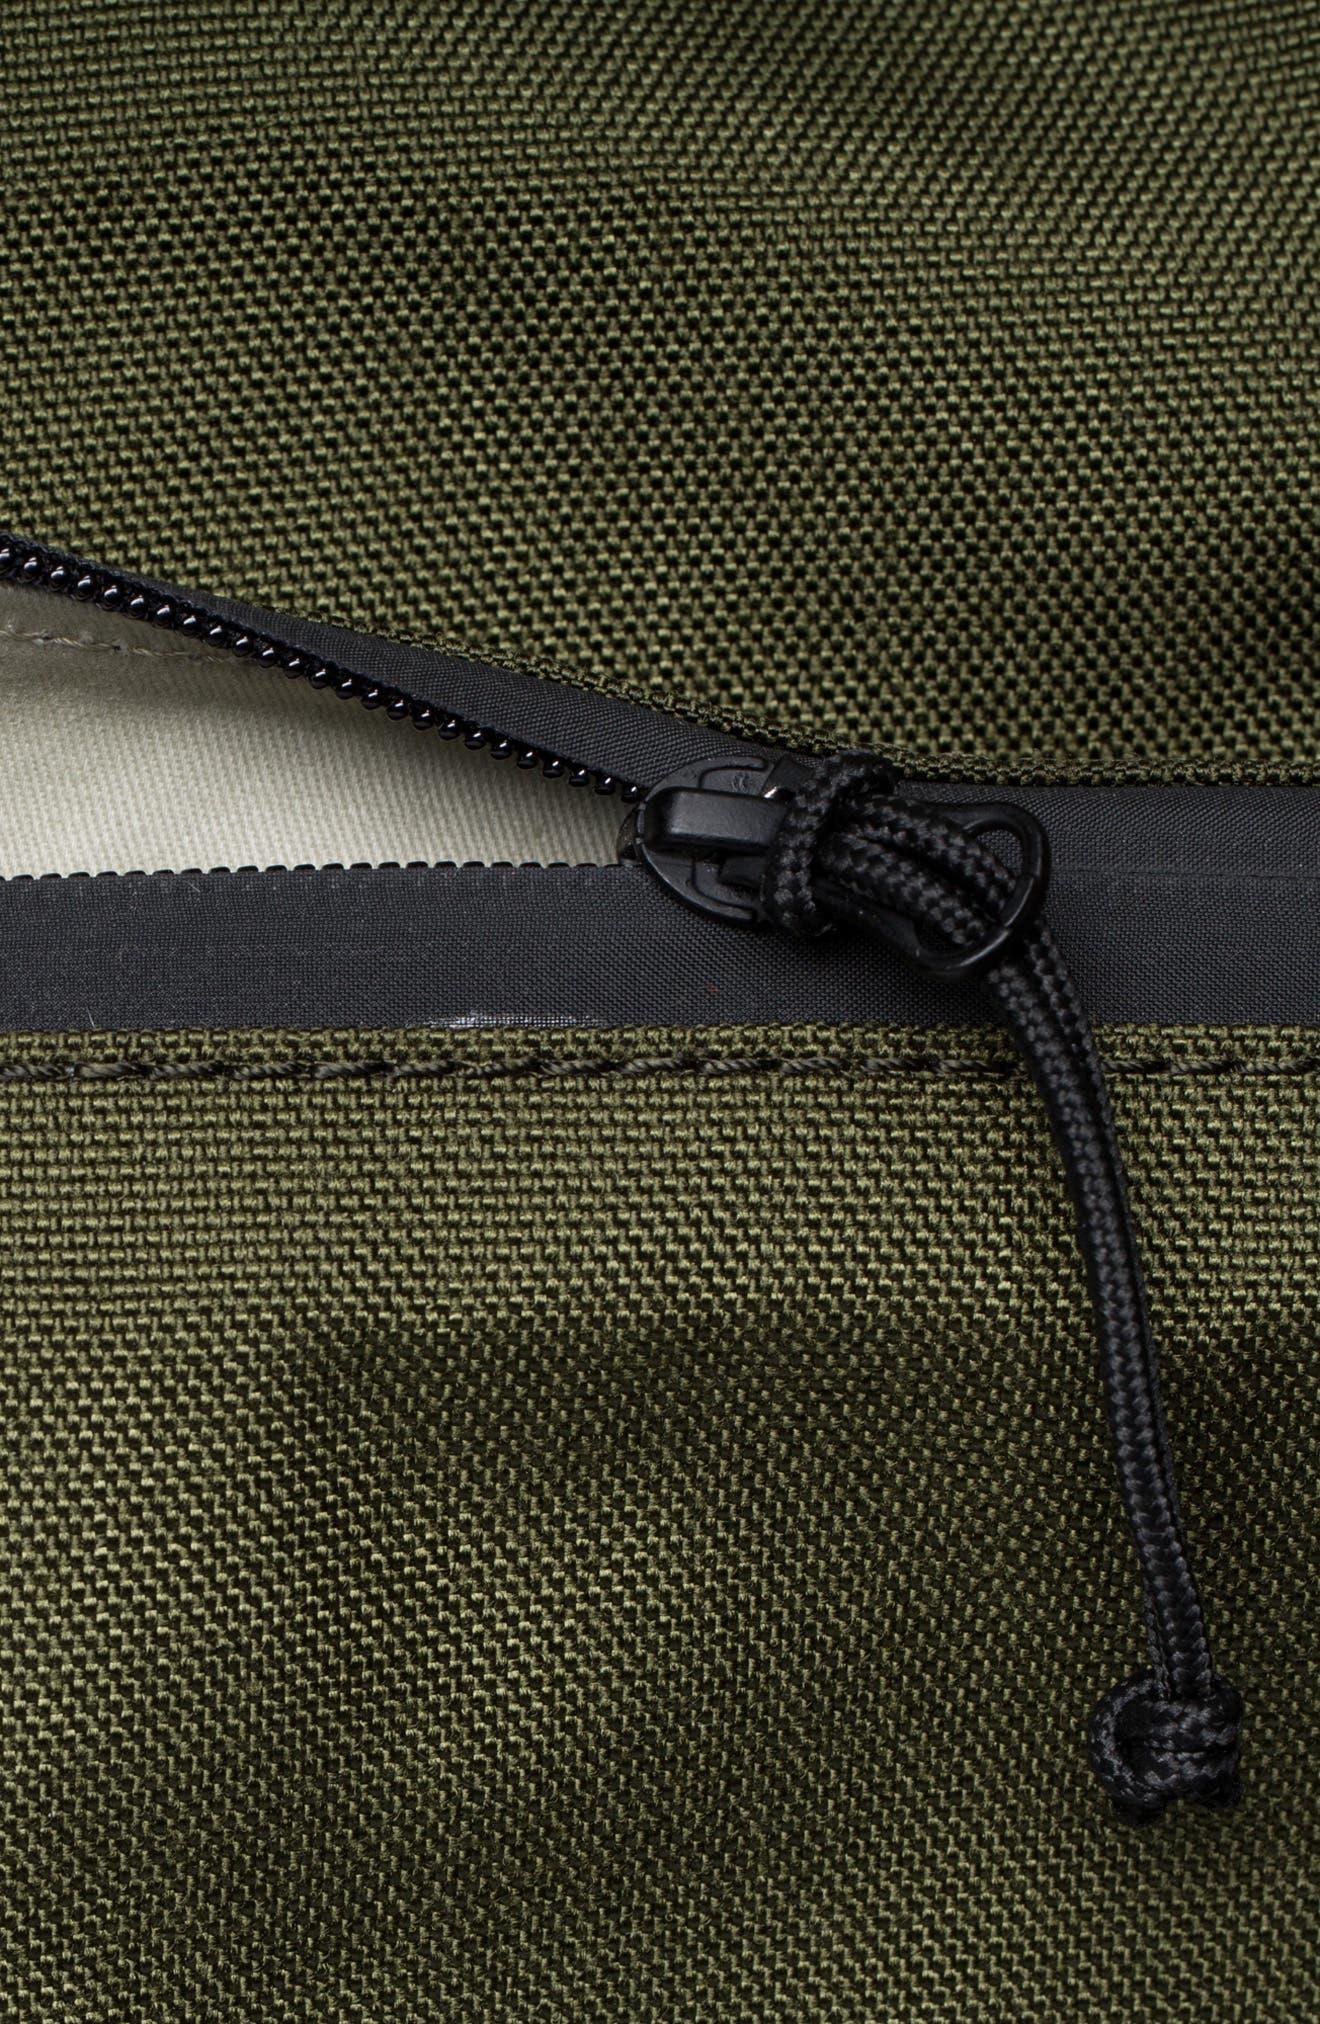 SWS 50L Roll Top Duffel Bag,                             Alternate thumbnail 7, color,                             OLIVE